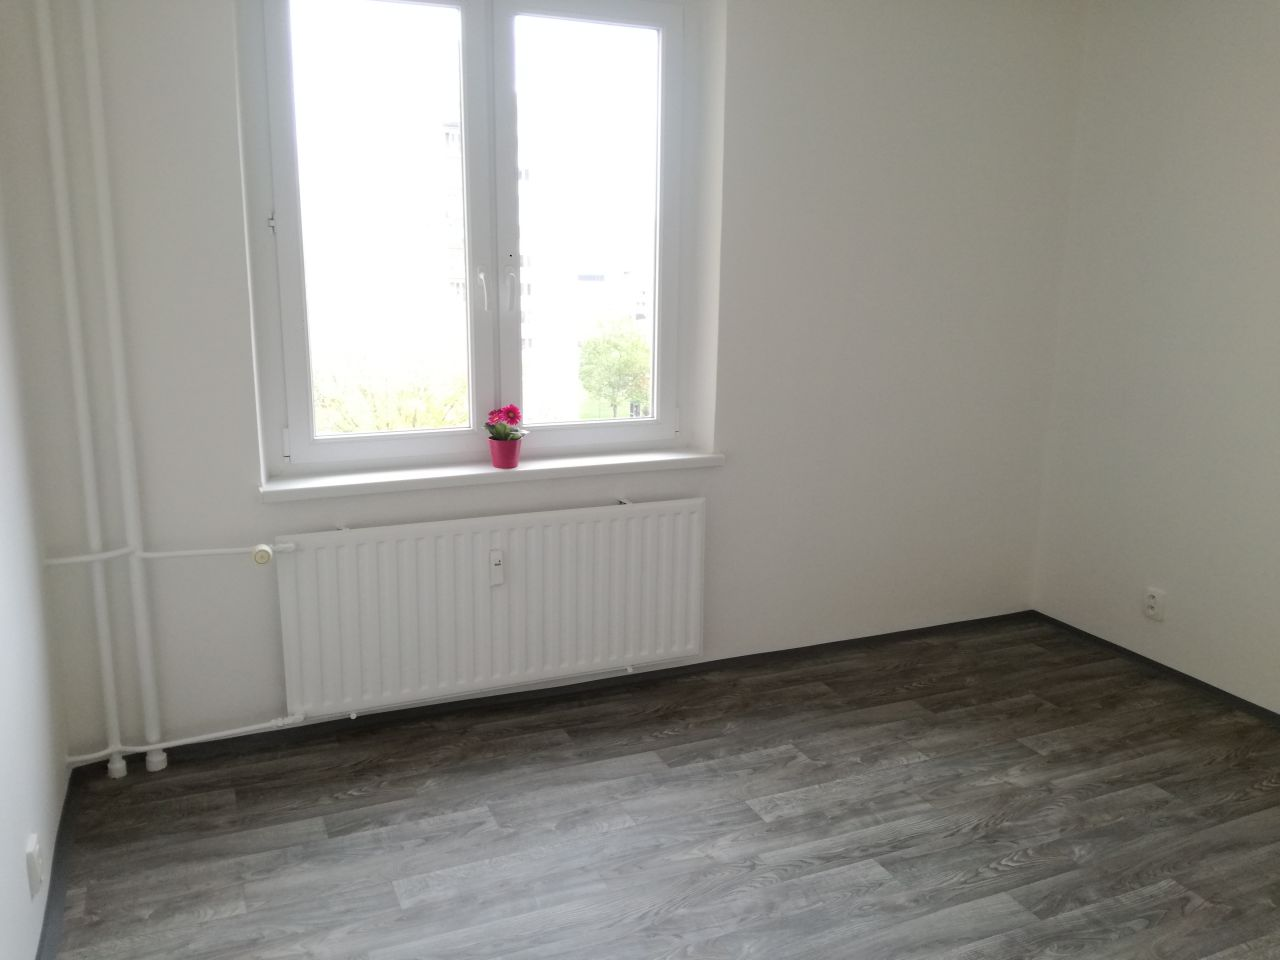 Pronájem bytu 3+1 65 m2, ul. Antonína Poledníka 4/8, Ostrava - Dubina